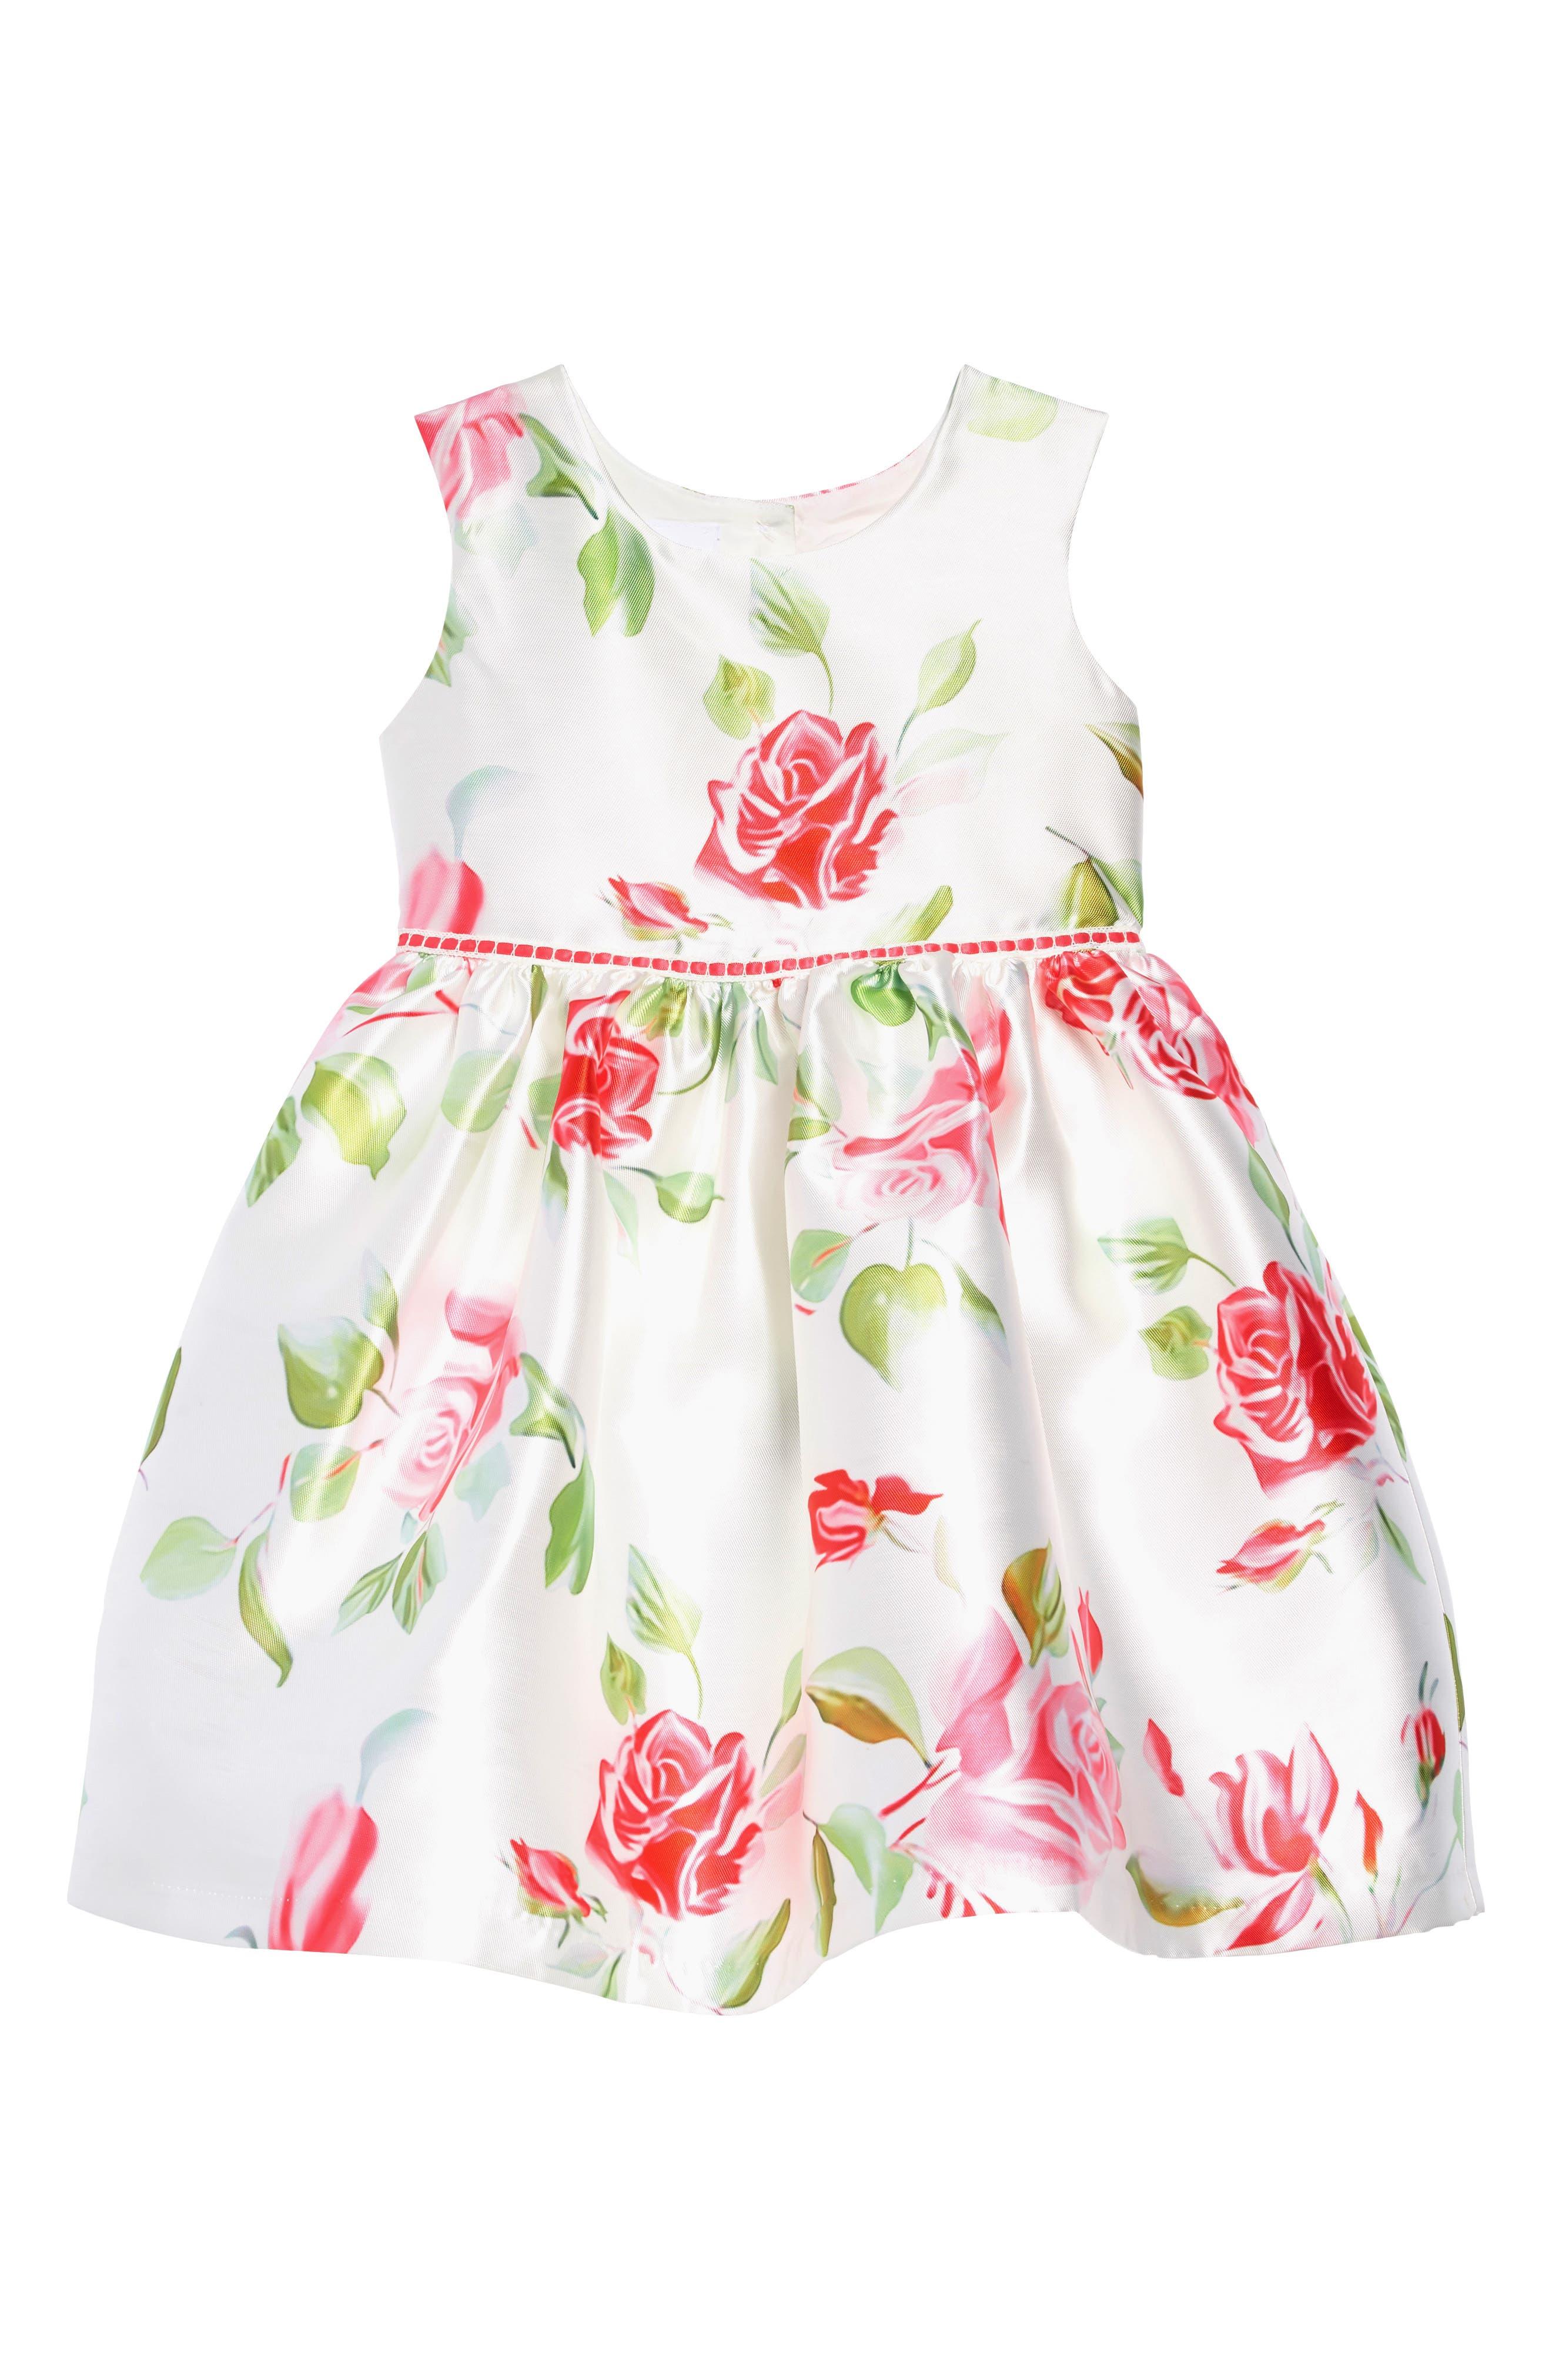 FRAIS Rose Garden Fit & Flare Dress, Main, color, WHITE / PINK